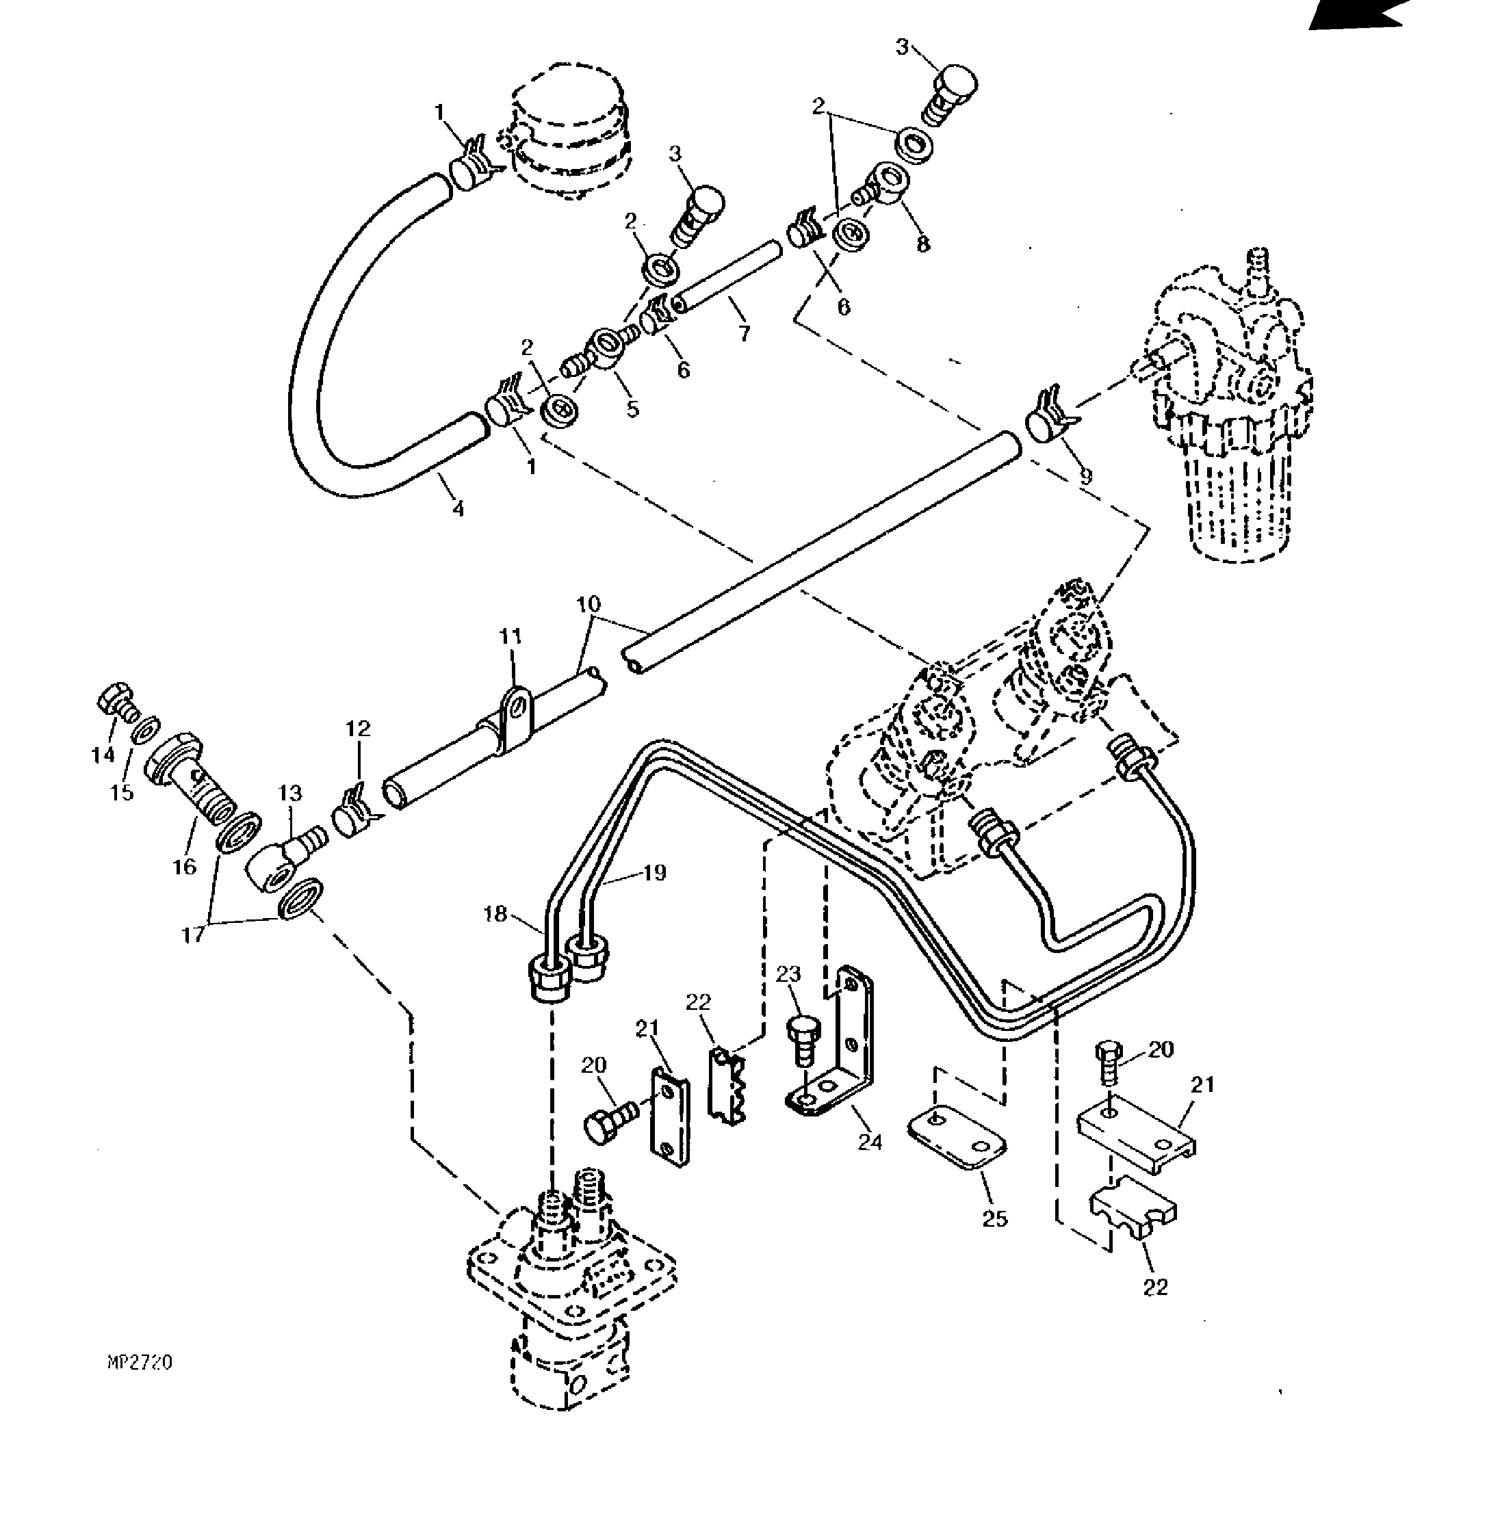 Wiring Schematic For Whirlpool Gx5fhdxvb Great Installation Of Diagram Washer Motor 2252130 Library Rh 91 Boptions1 De Refrigerator